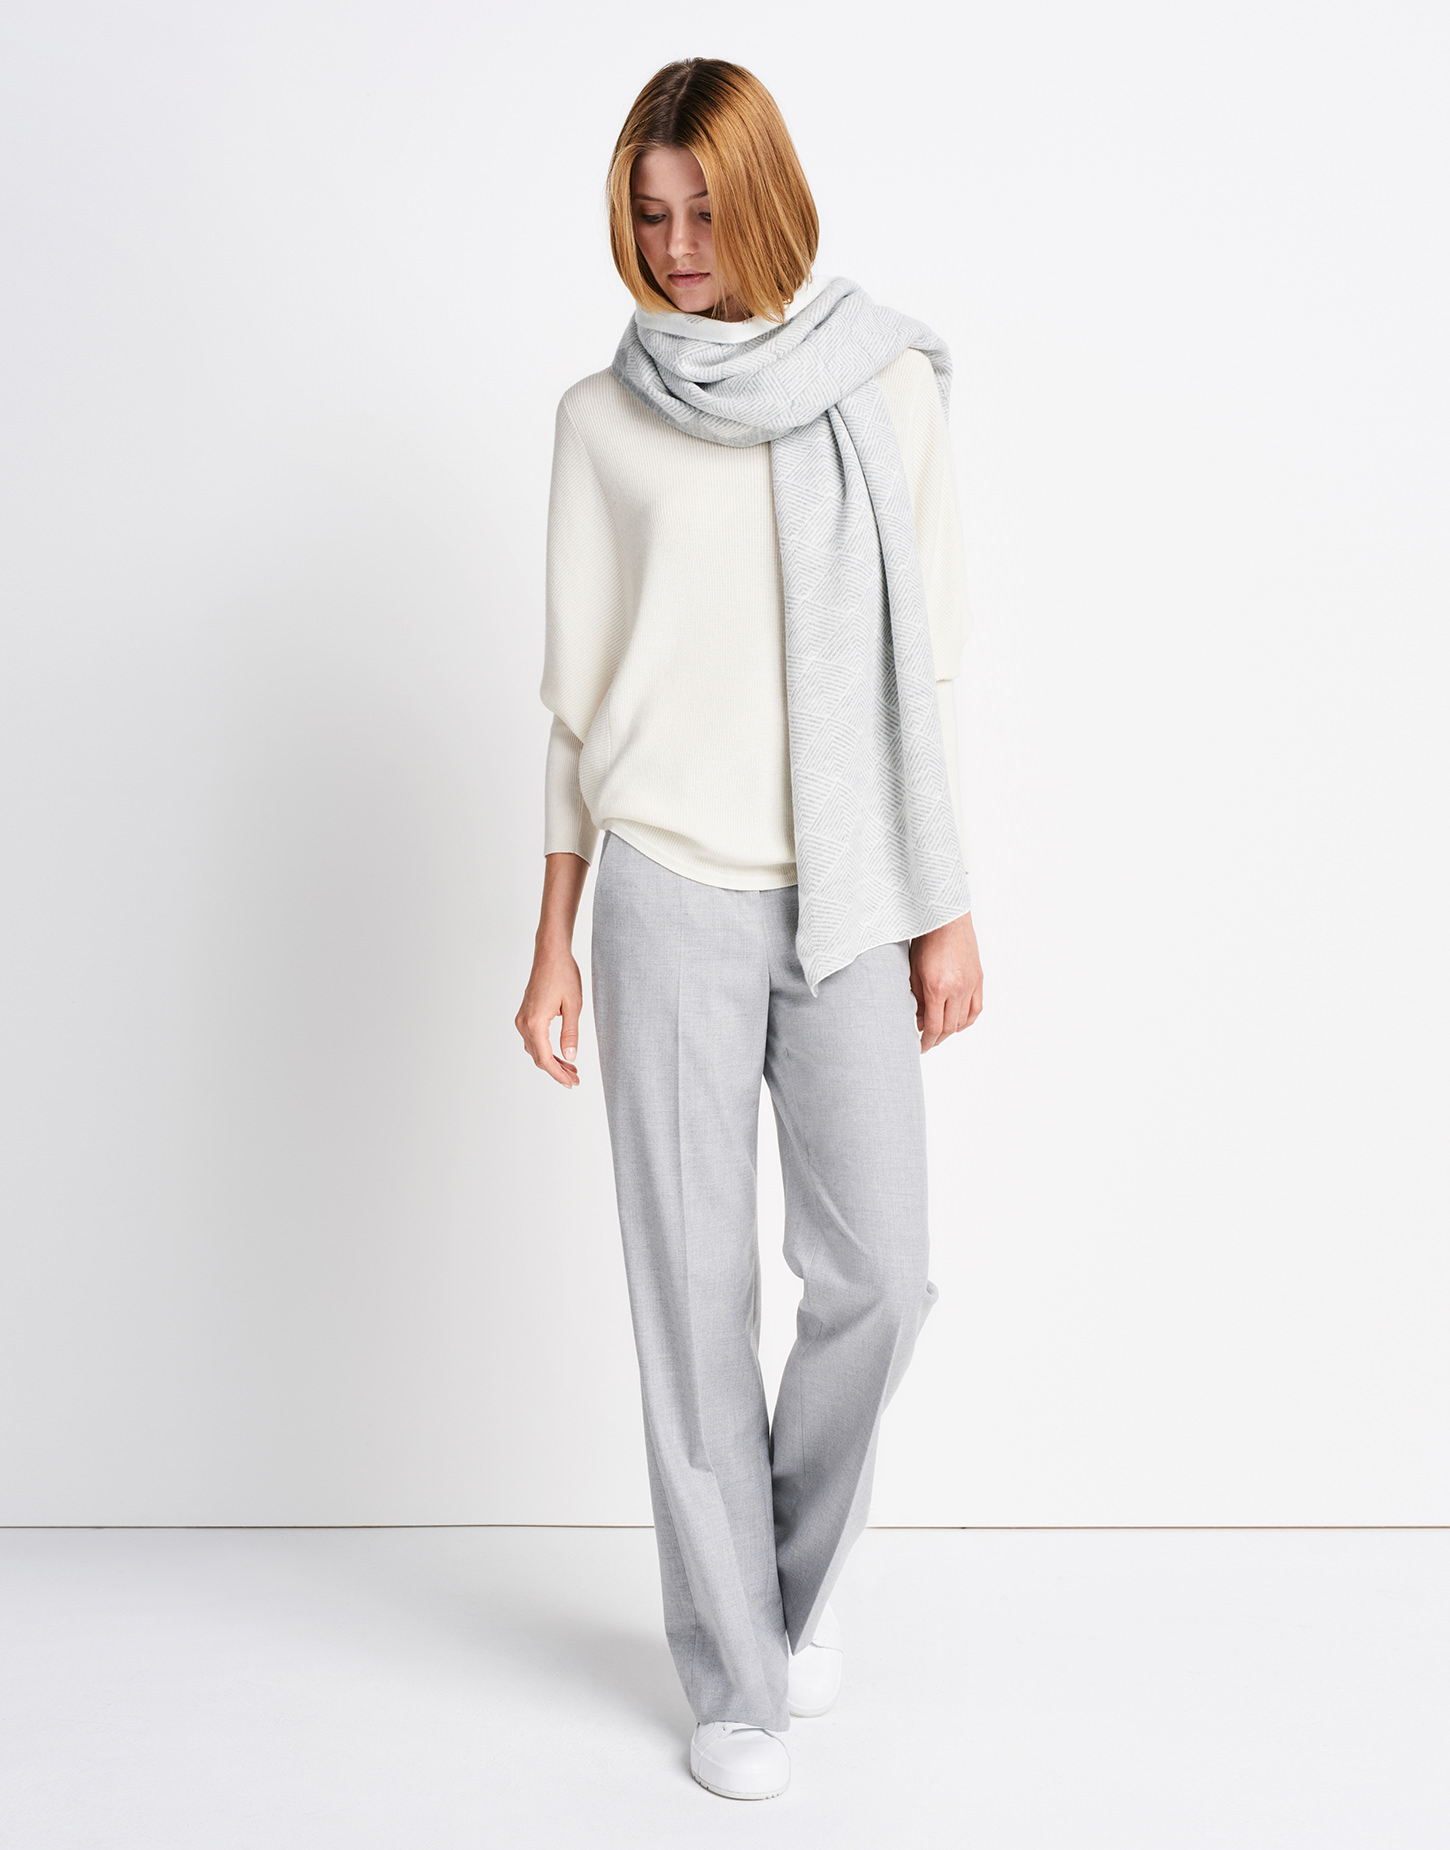 schal brooklyn scarf wei online bestellen someday online shop. Black Bedroom Furniture Sets. Home Design Ideas